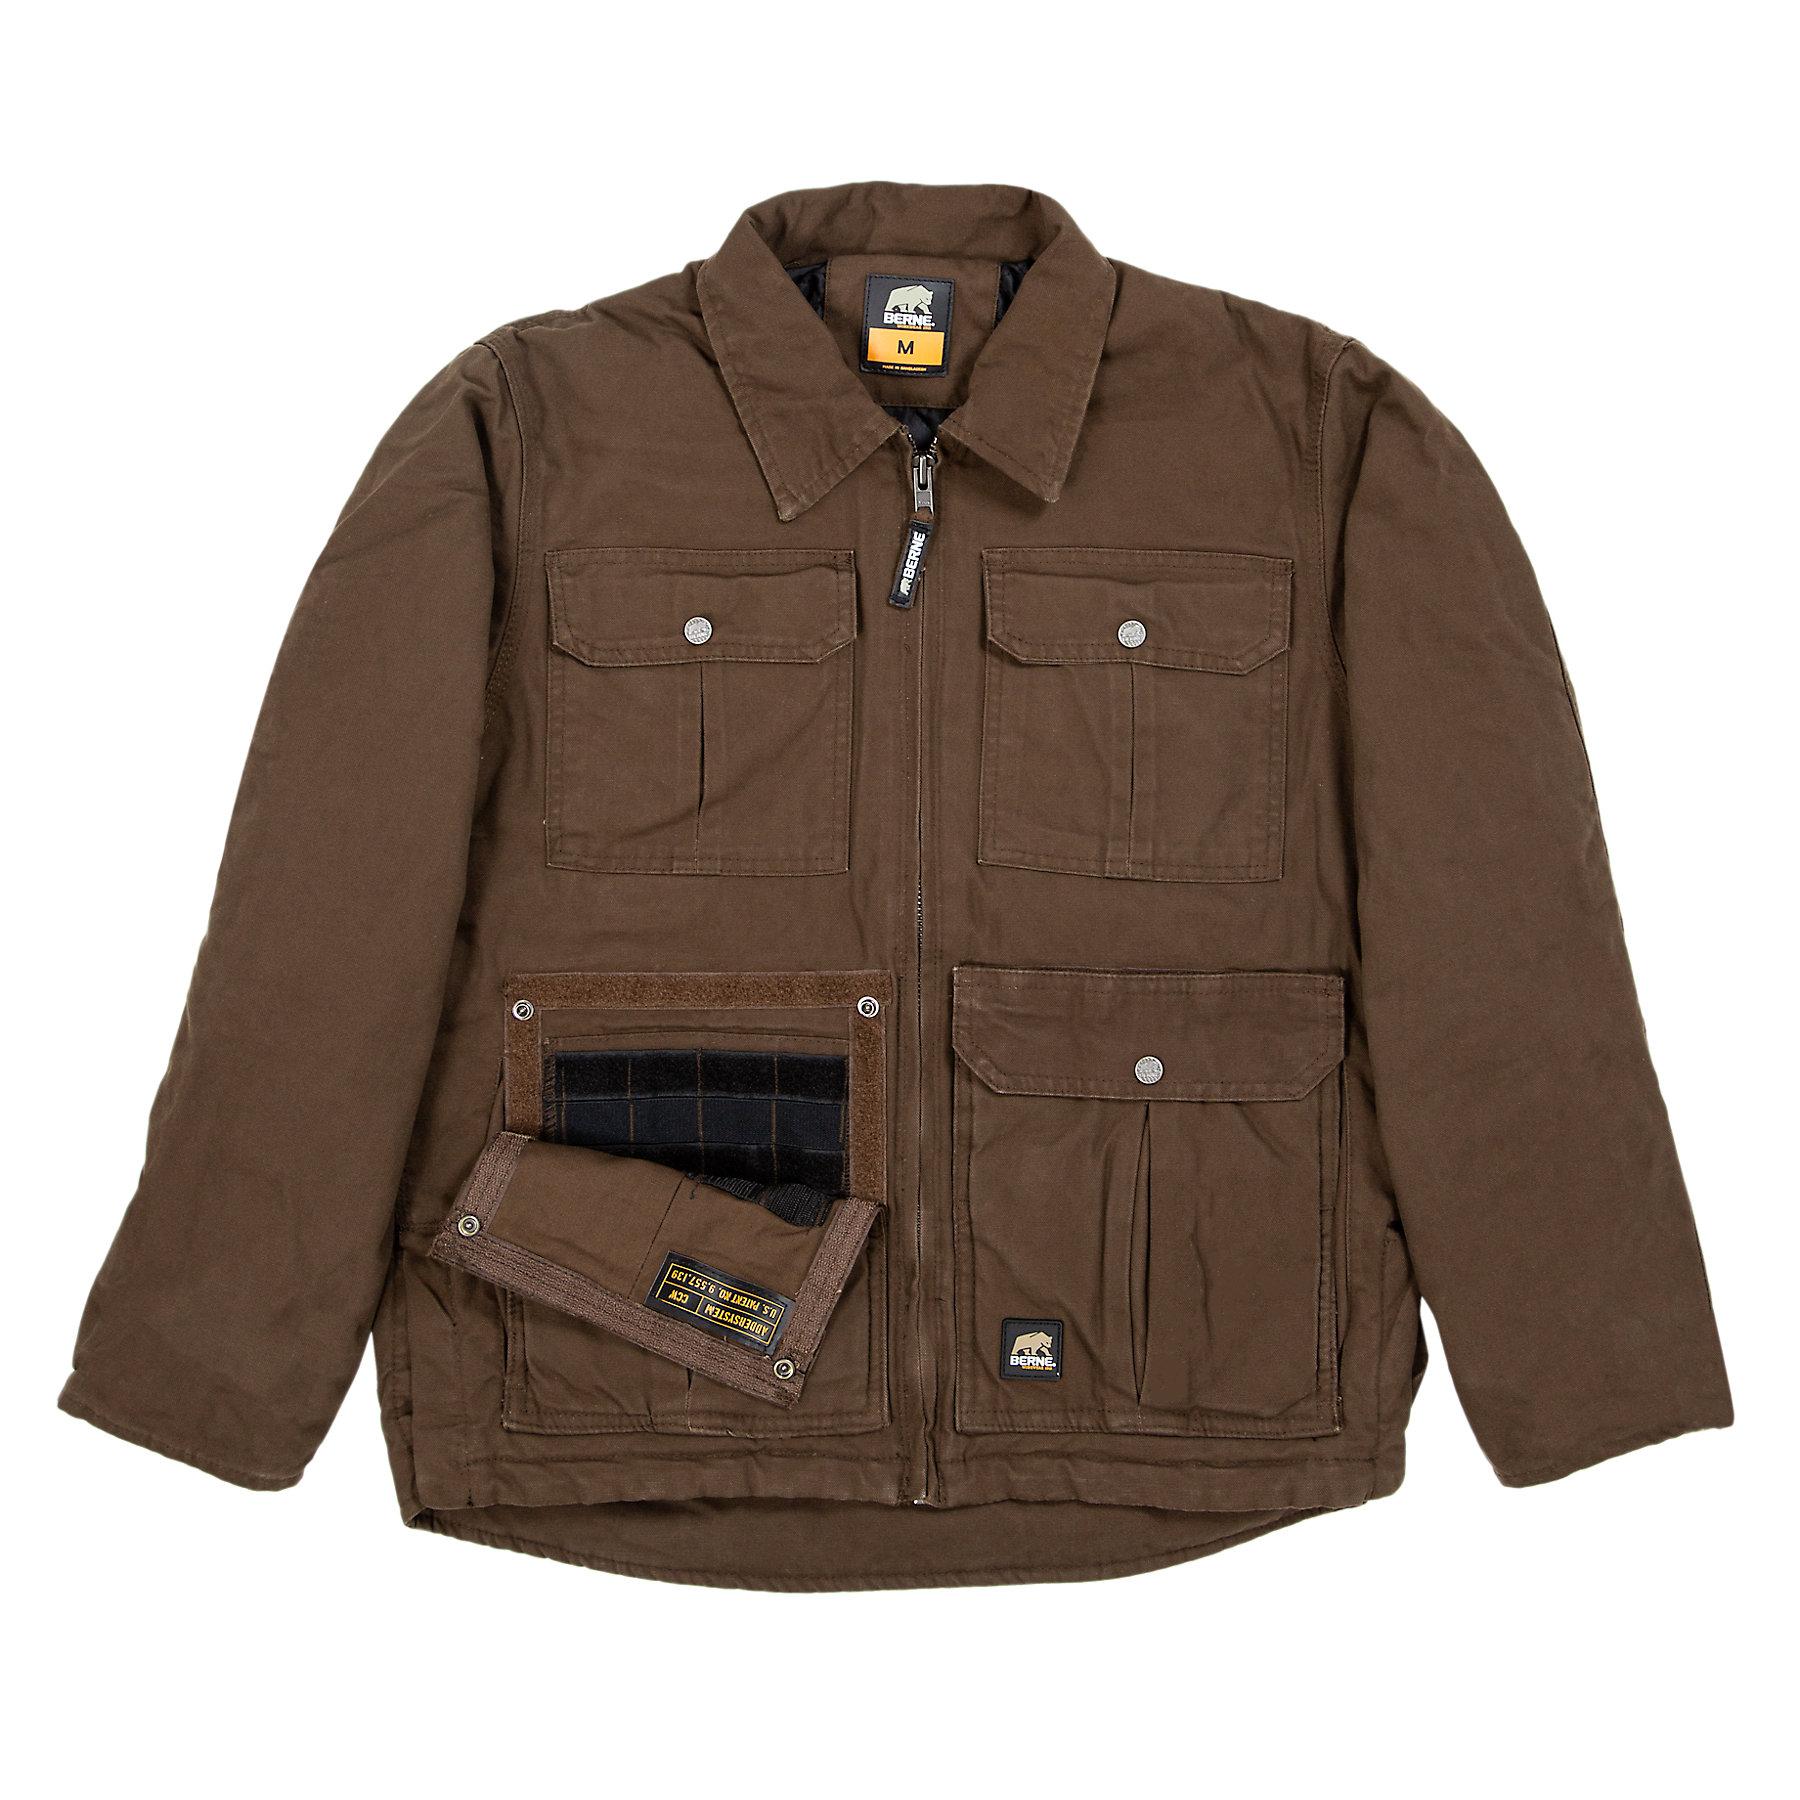 Buy Lightweight Echo One One Jacket Berne Apparel Online At Best